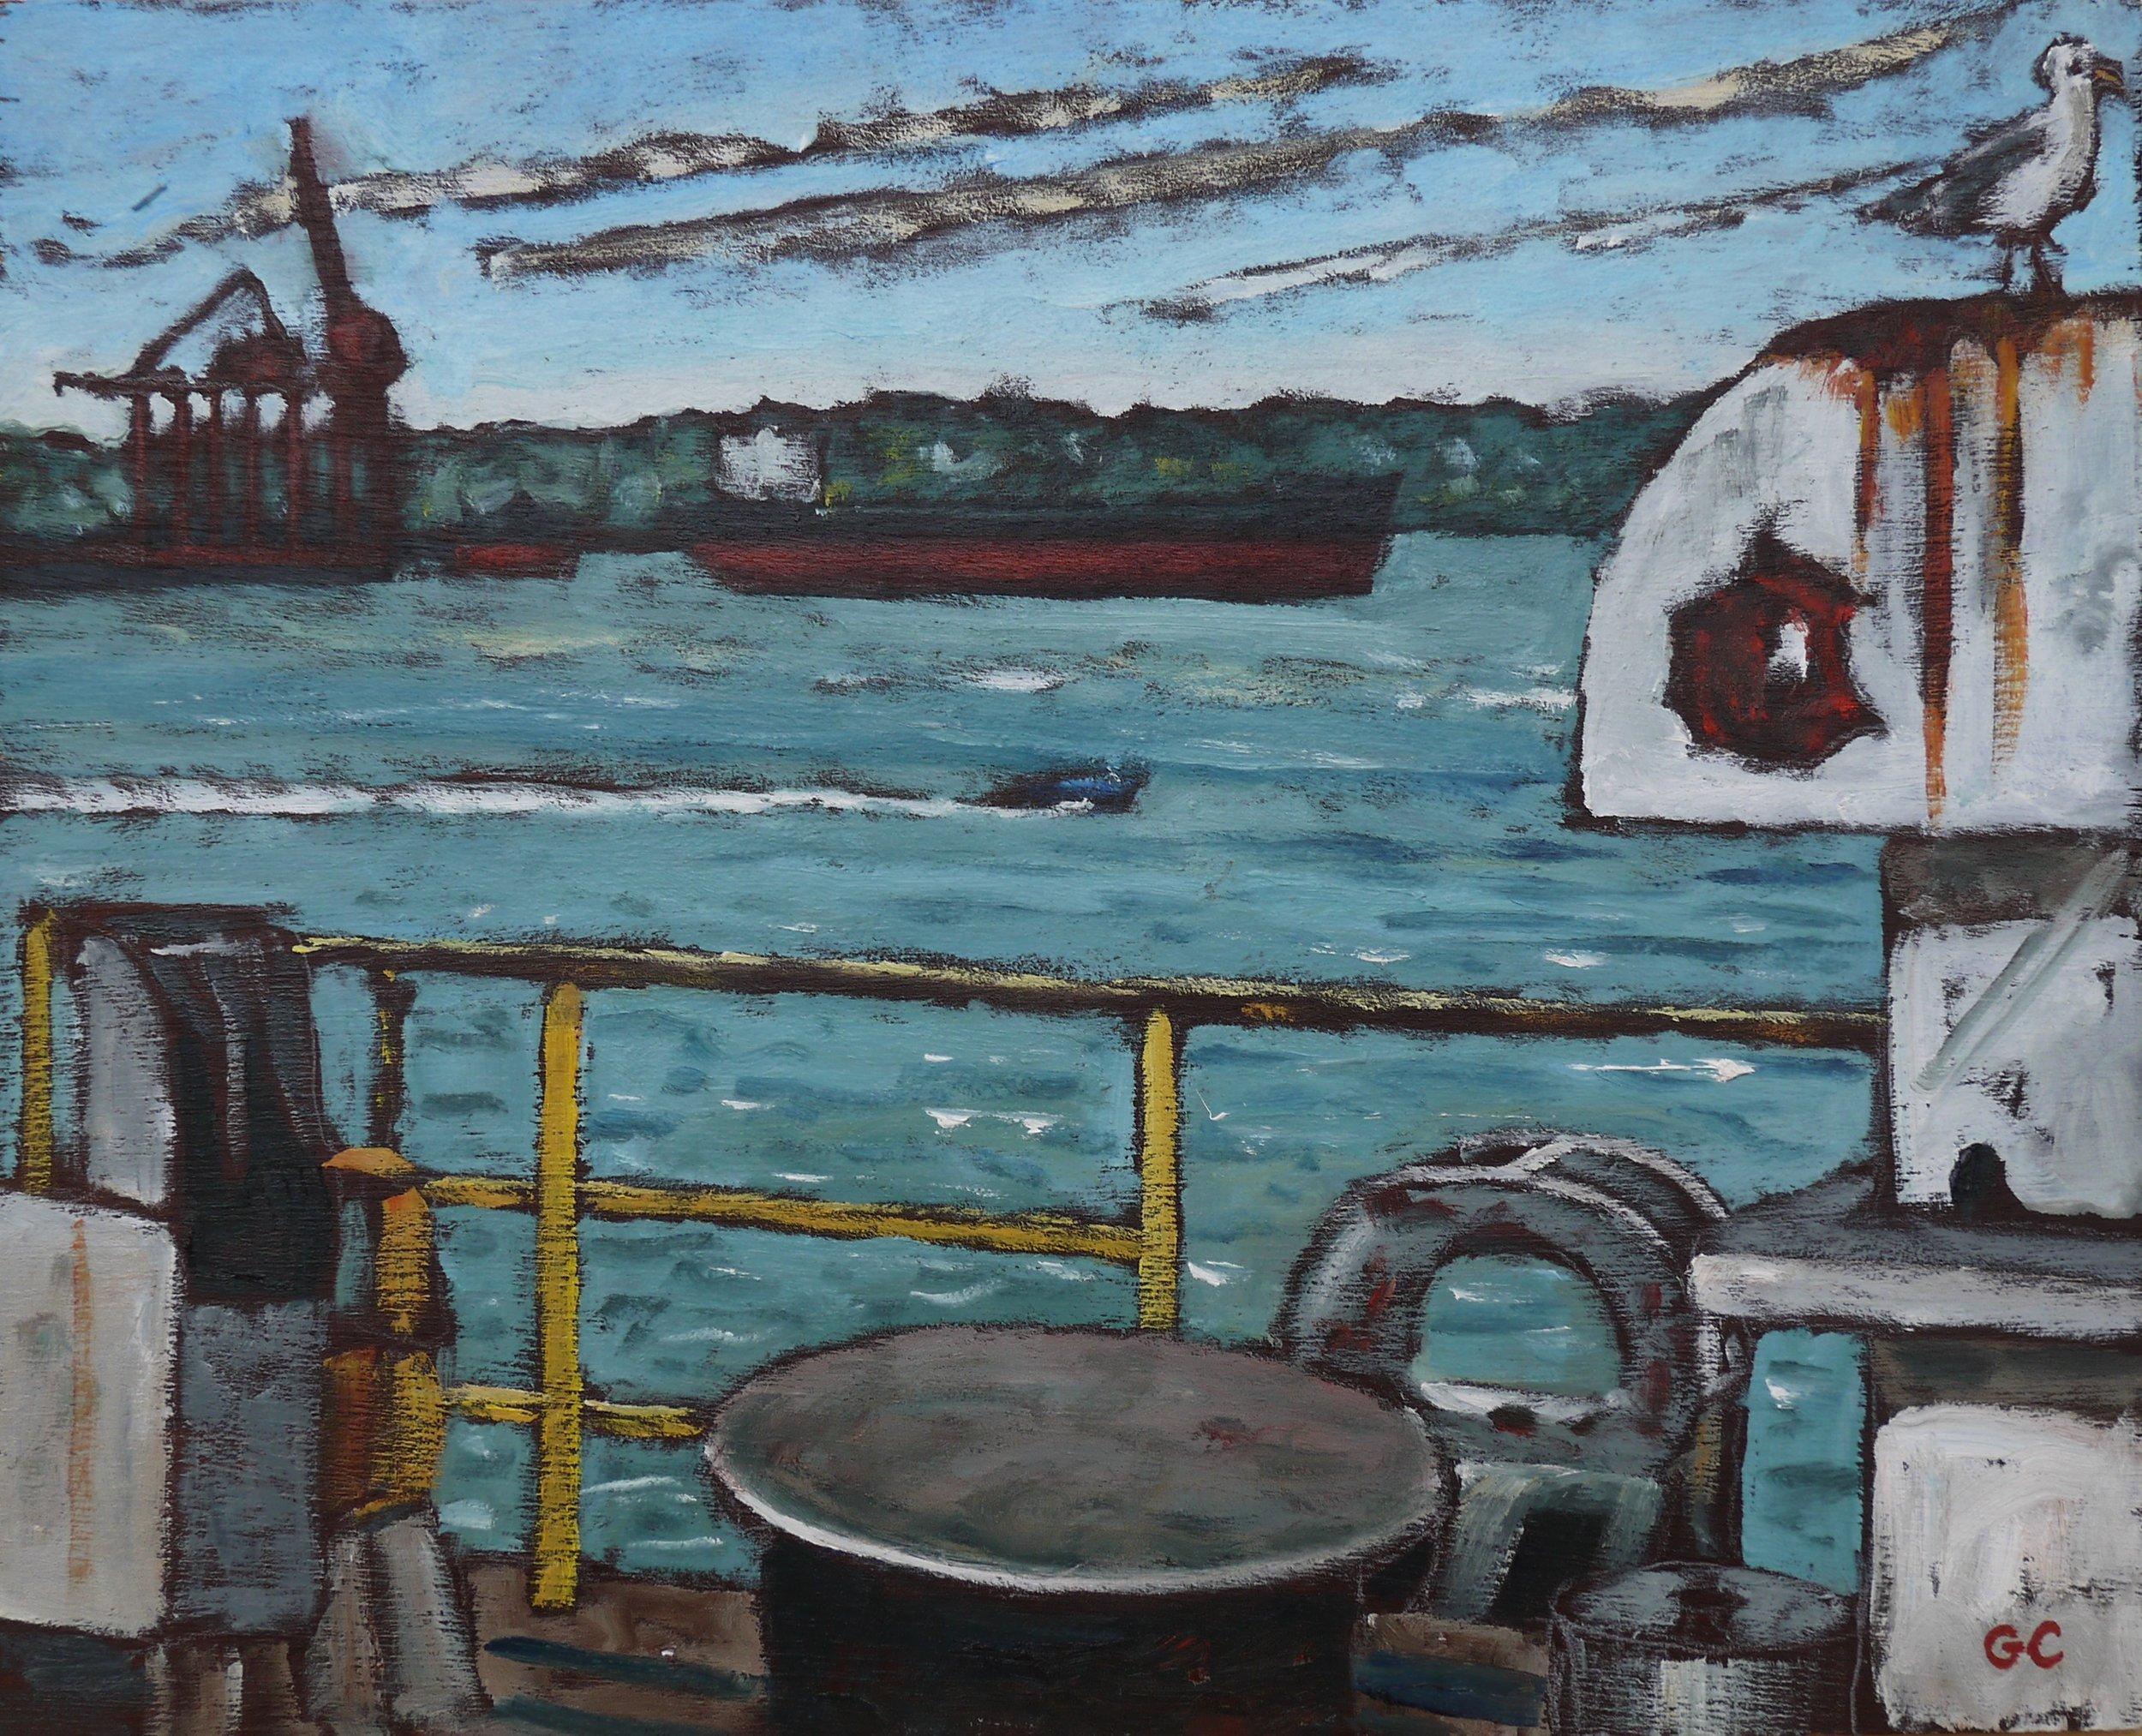 Vancouver Dry Dock, 2017